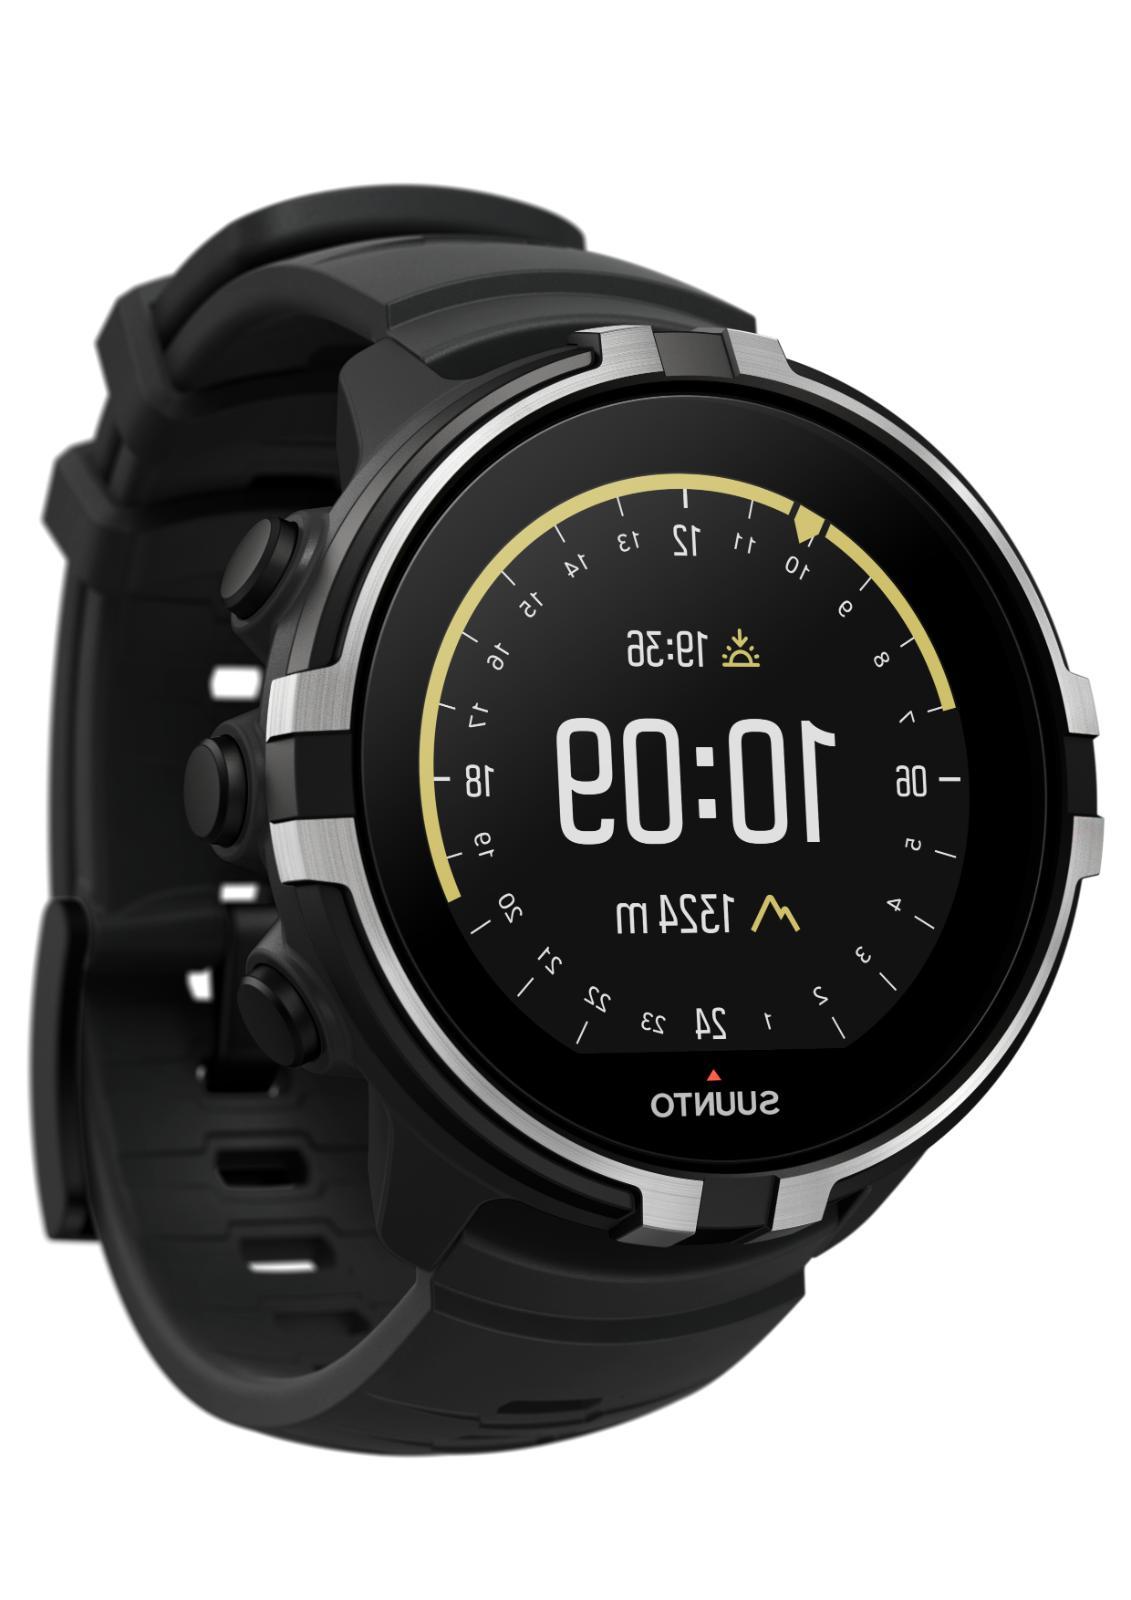 Suunto Sport Wrist HR Baro - Stealth